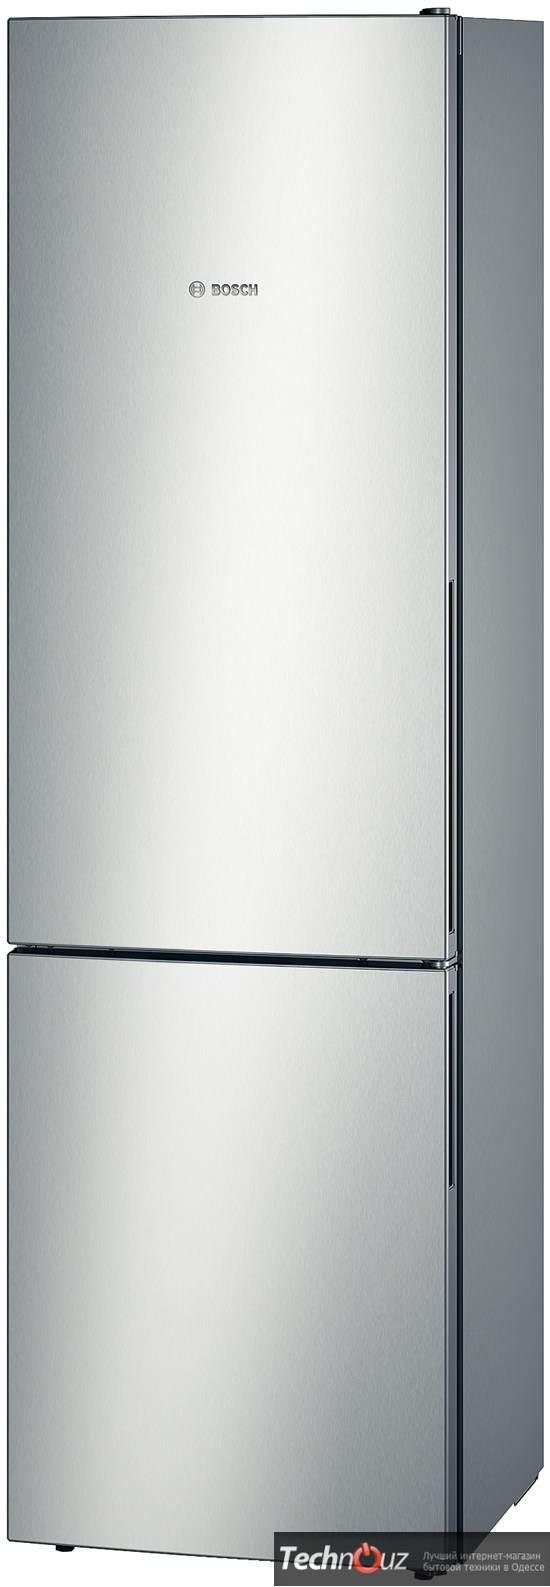 Холодильник bosch kgv39vi31